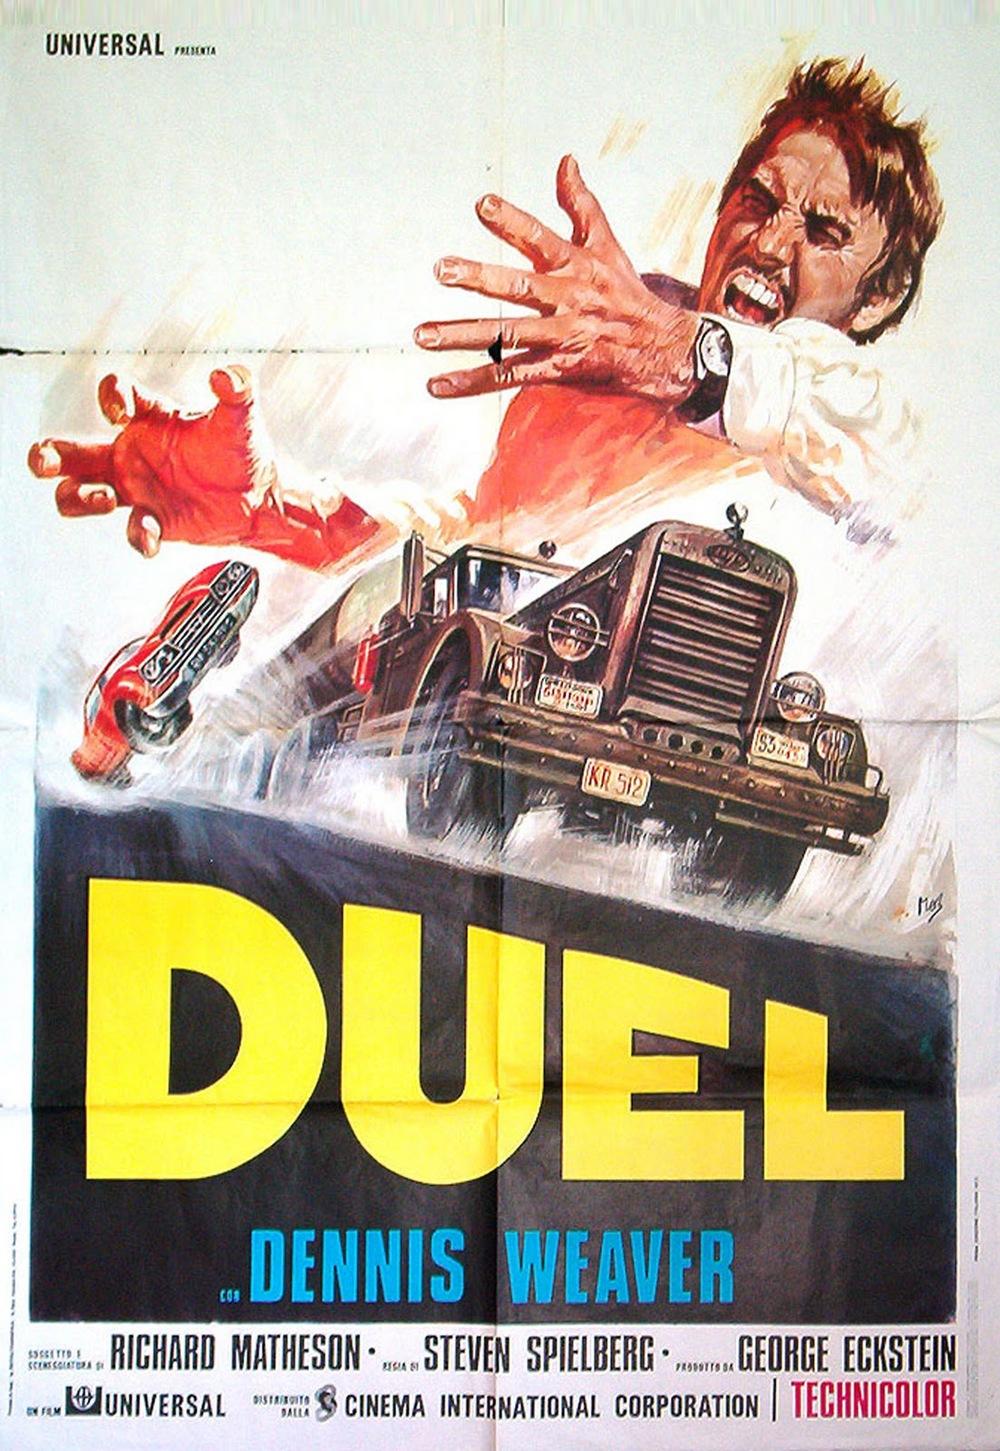 Duell, Autokino 2004